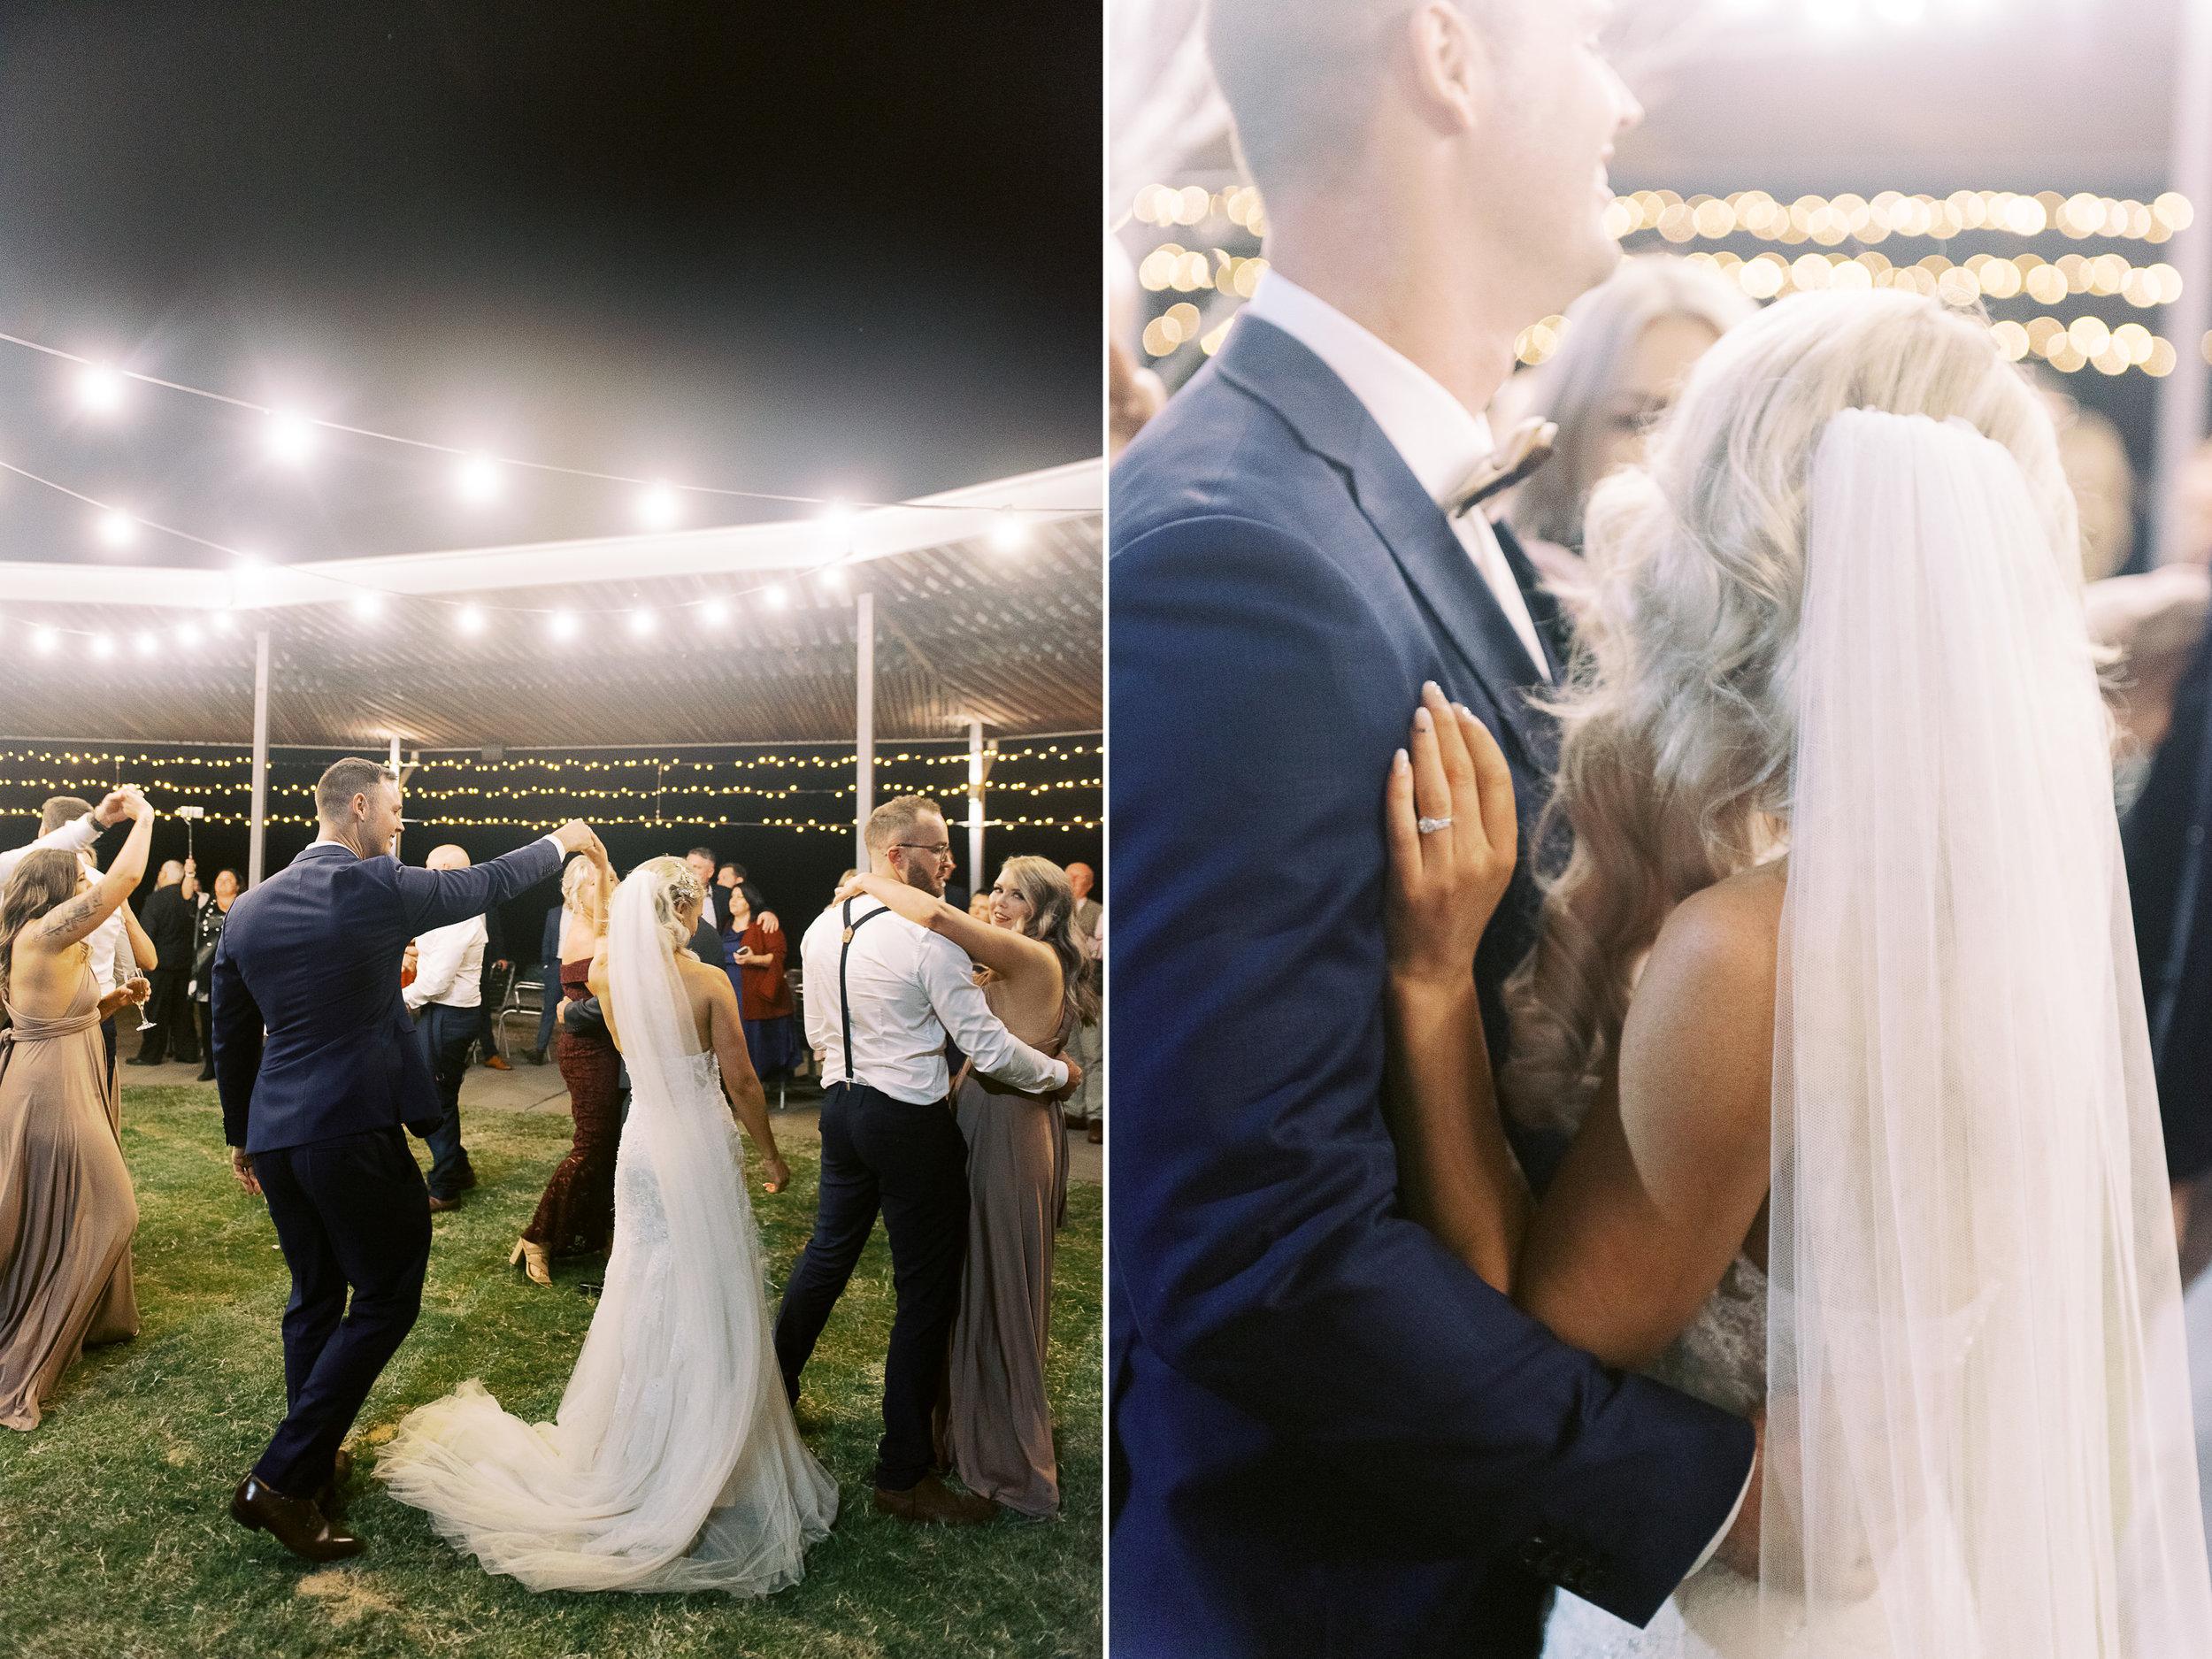 kooroomba-lavendar-farm-film-photography-wedding-photography-romantic-27.jpg